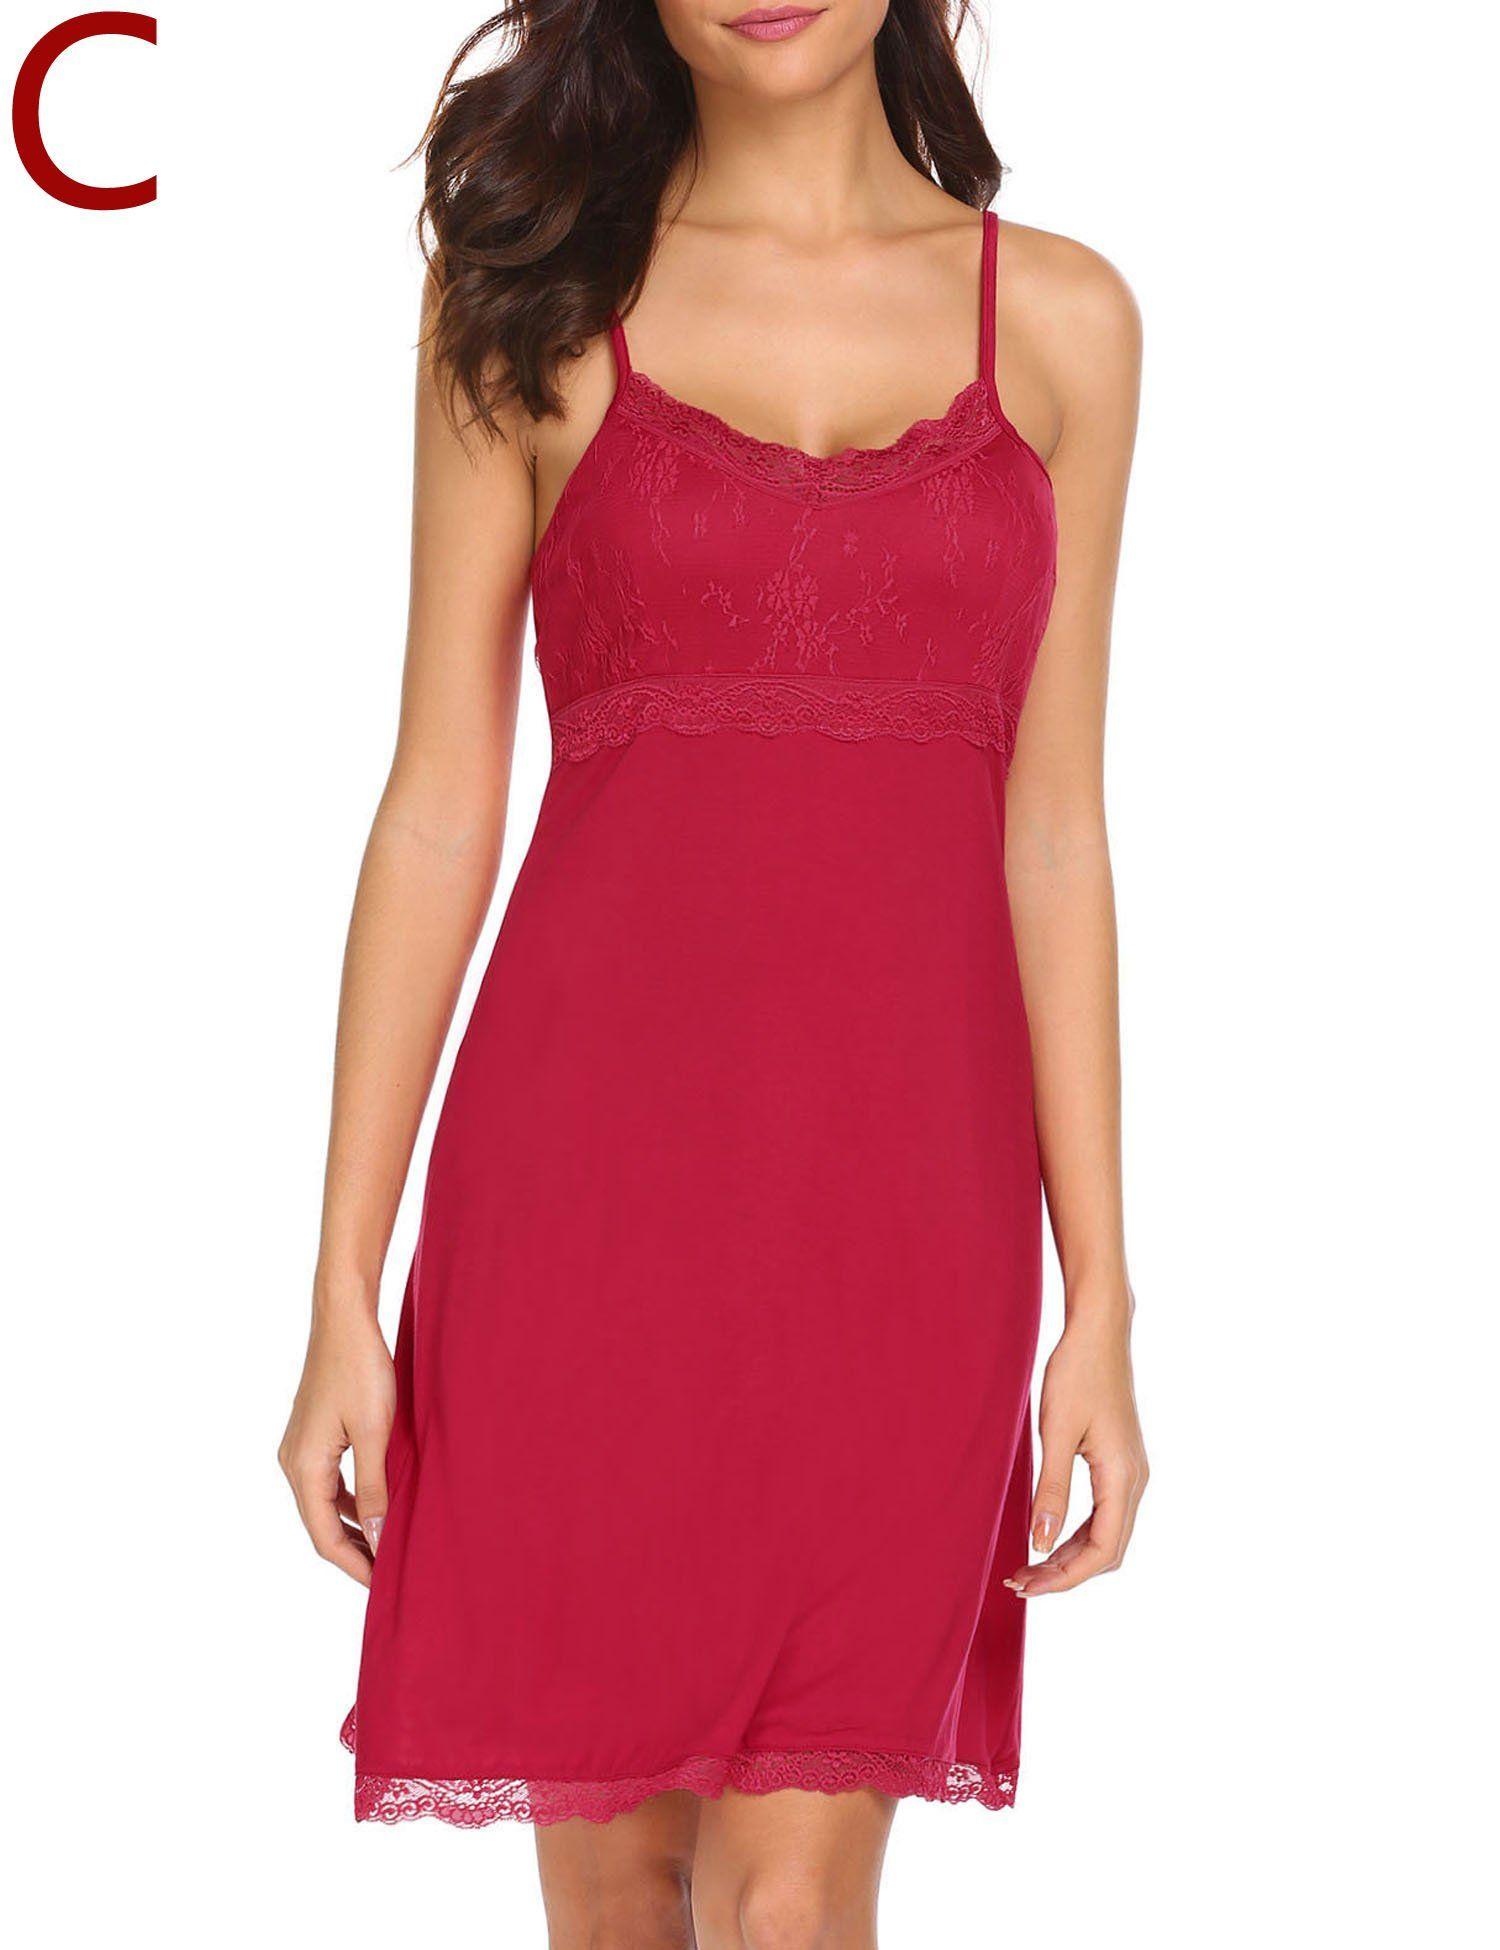 MAXMODA Womens Full Slip Sleepwear Nightshirts Lace Trim Slip Chemise Nightgown Under Dresses S-XXL